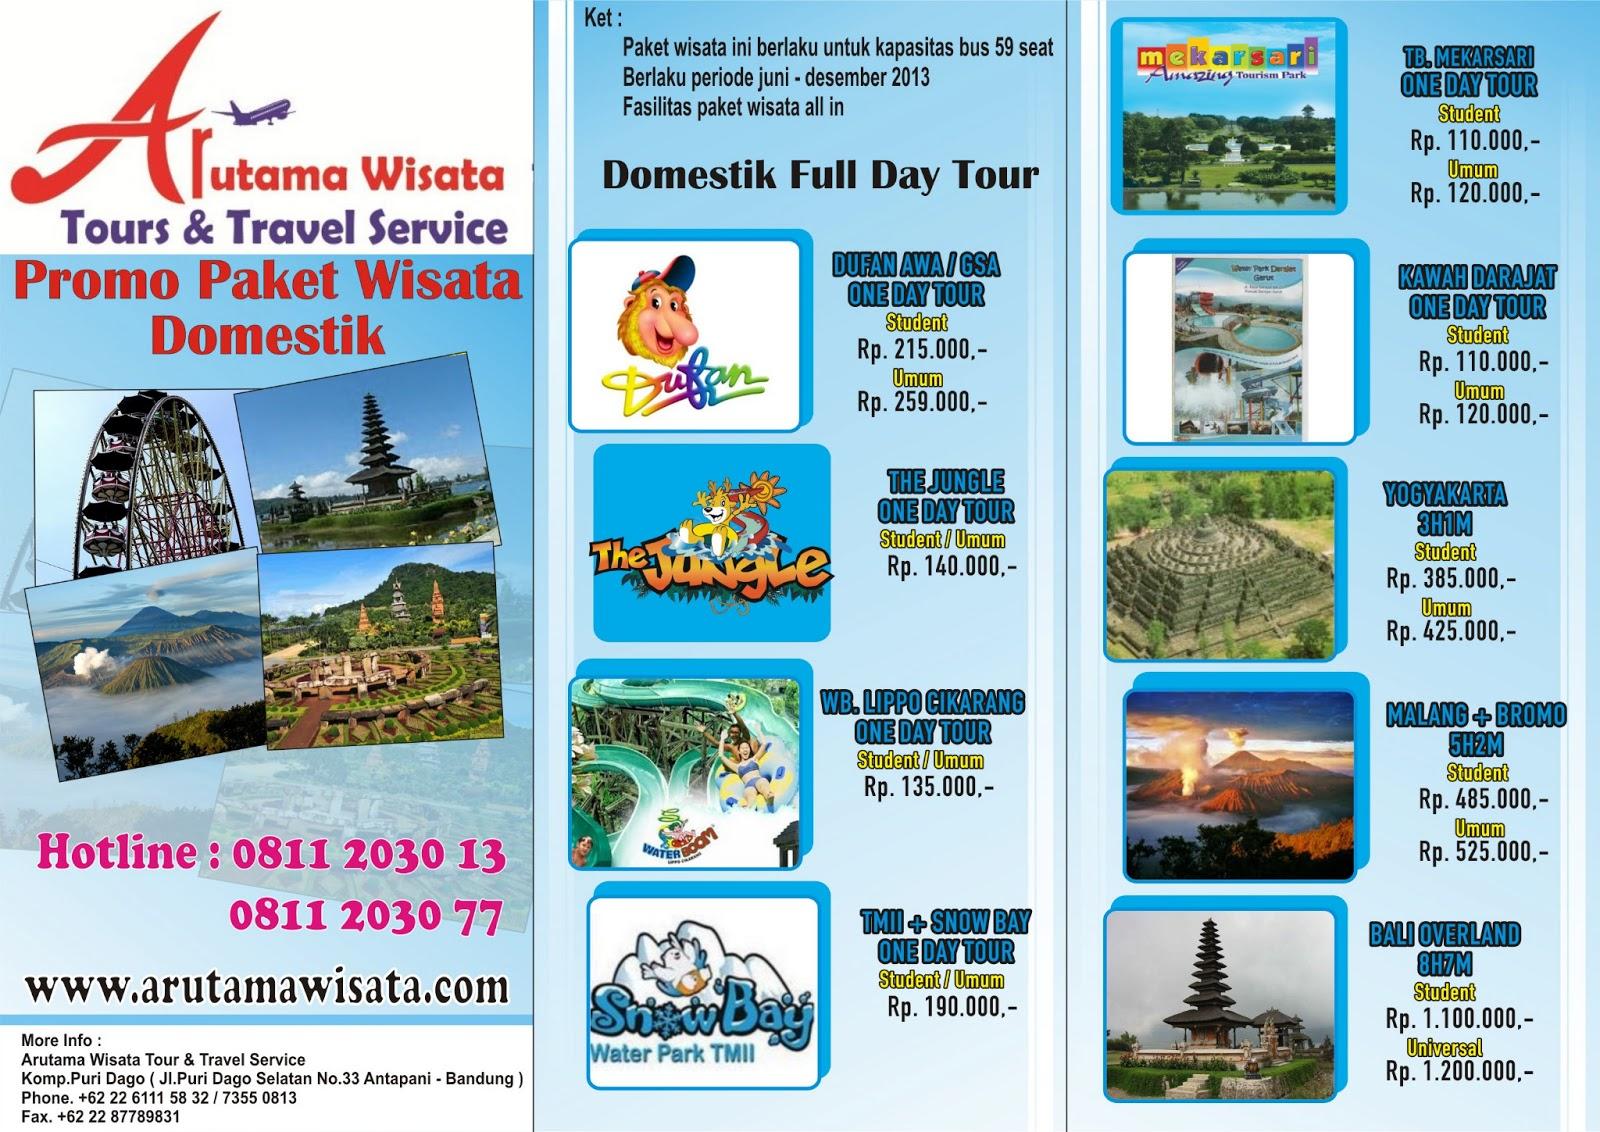 Arutama Wisata Tour & Travel Service: Promo Paket Wisata ...